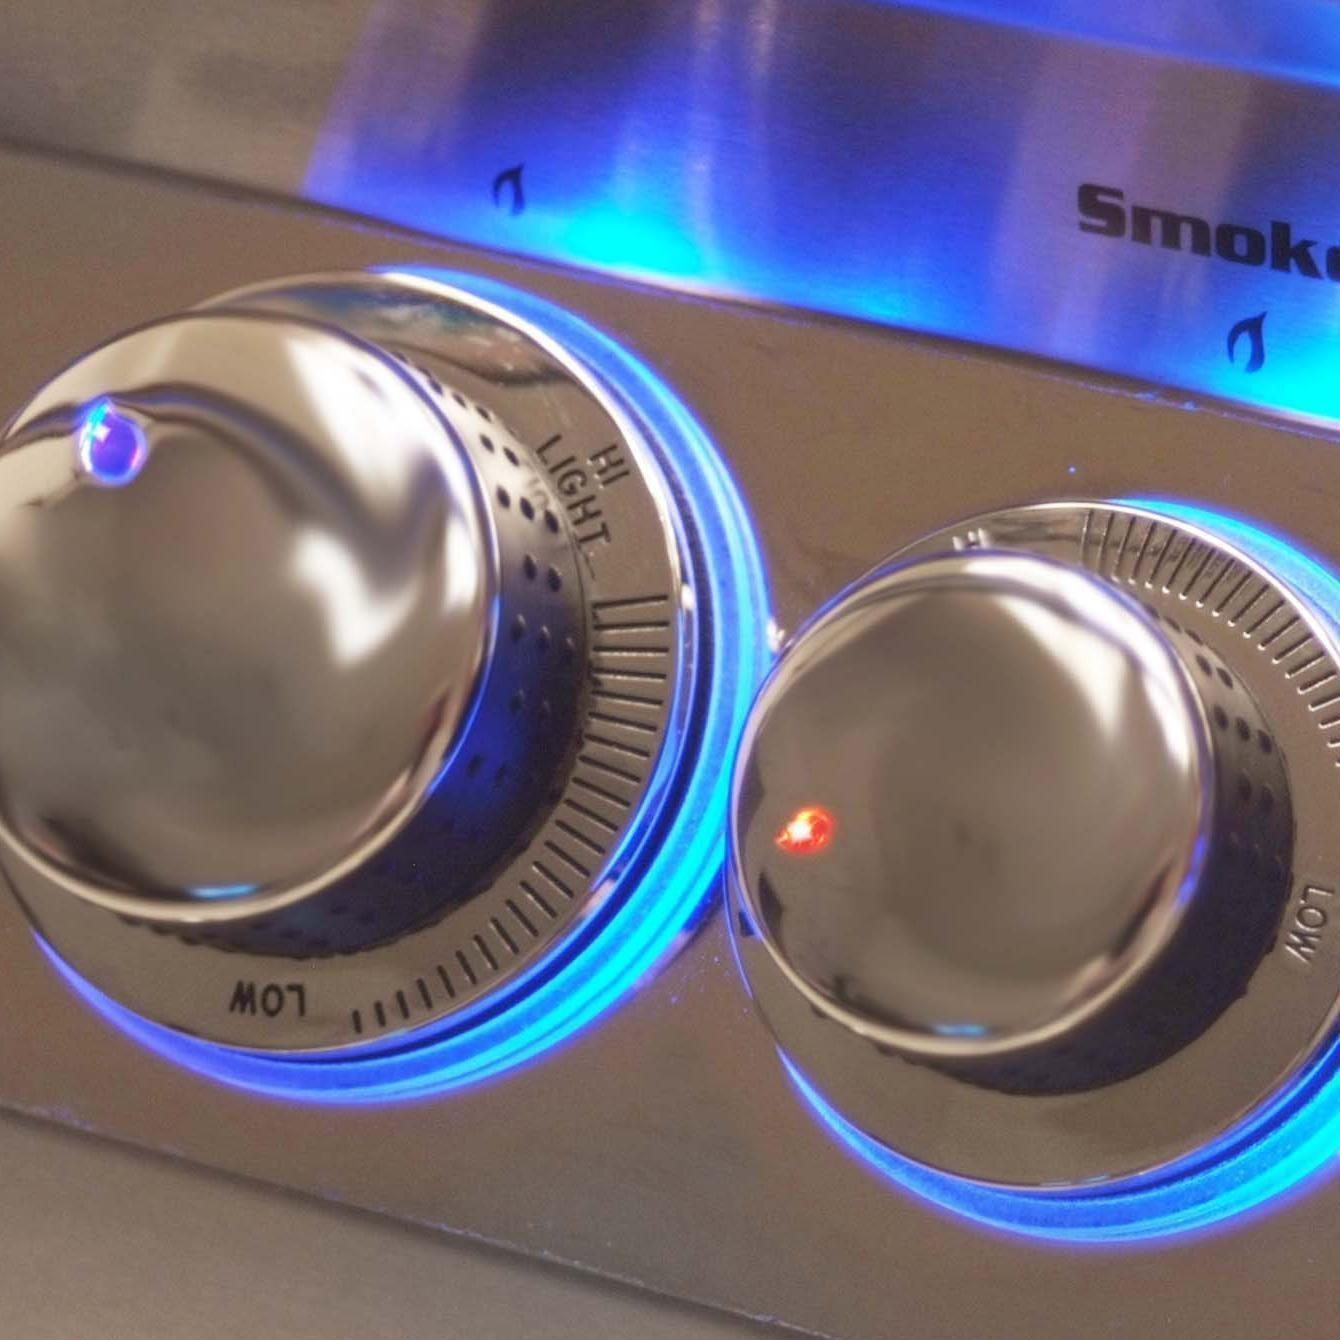 Fire Magic Echelon Diamond E790s Gas Grill - Back Lit Safety Knobs